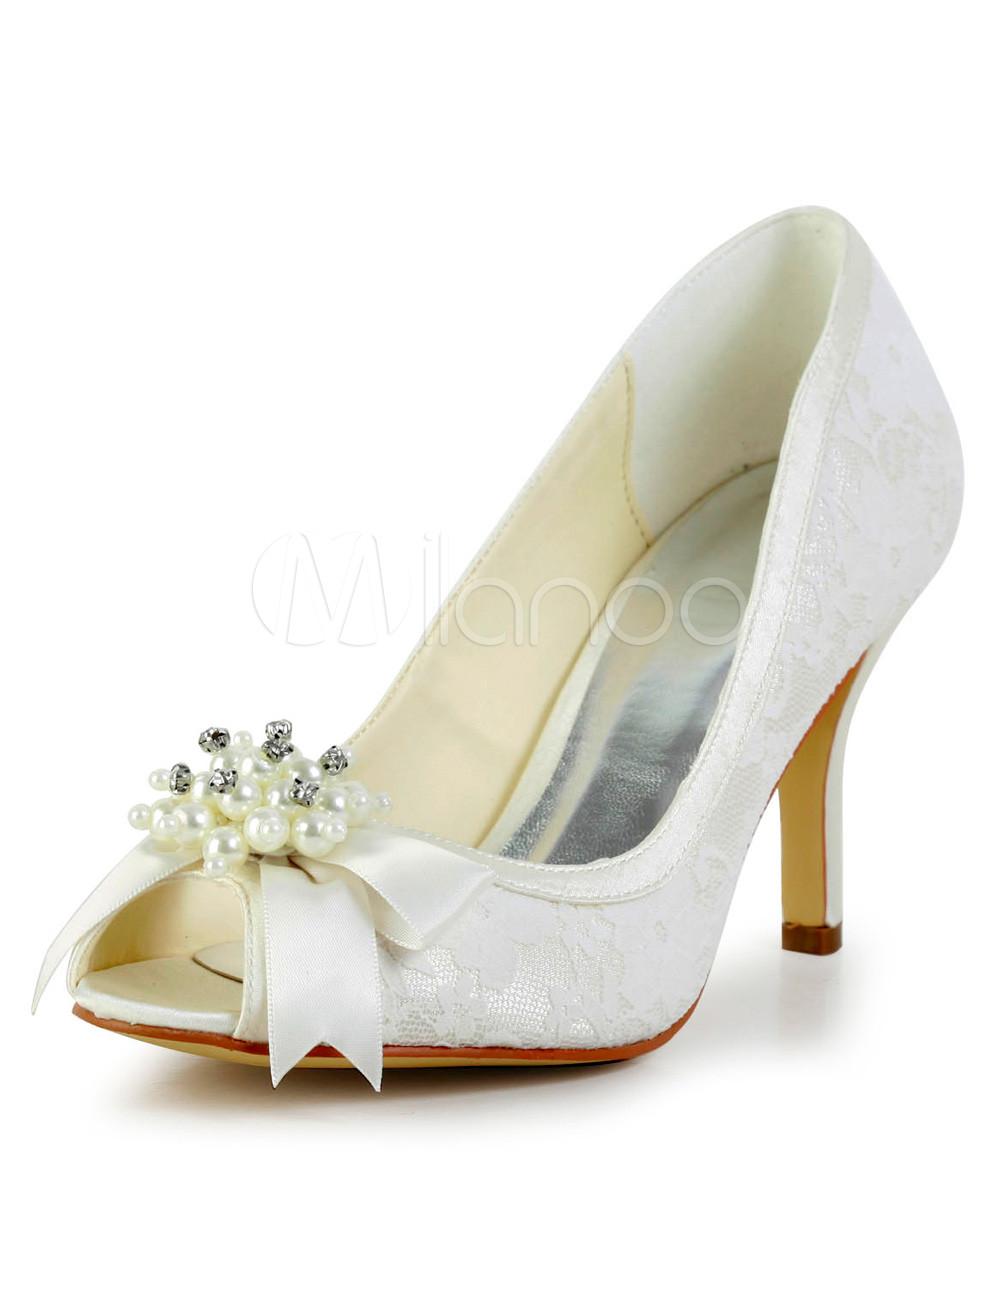 Great Ecru White Peep Toe Stiletto Heel Silk And Satin Shoes for Bride